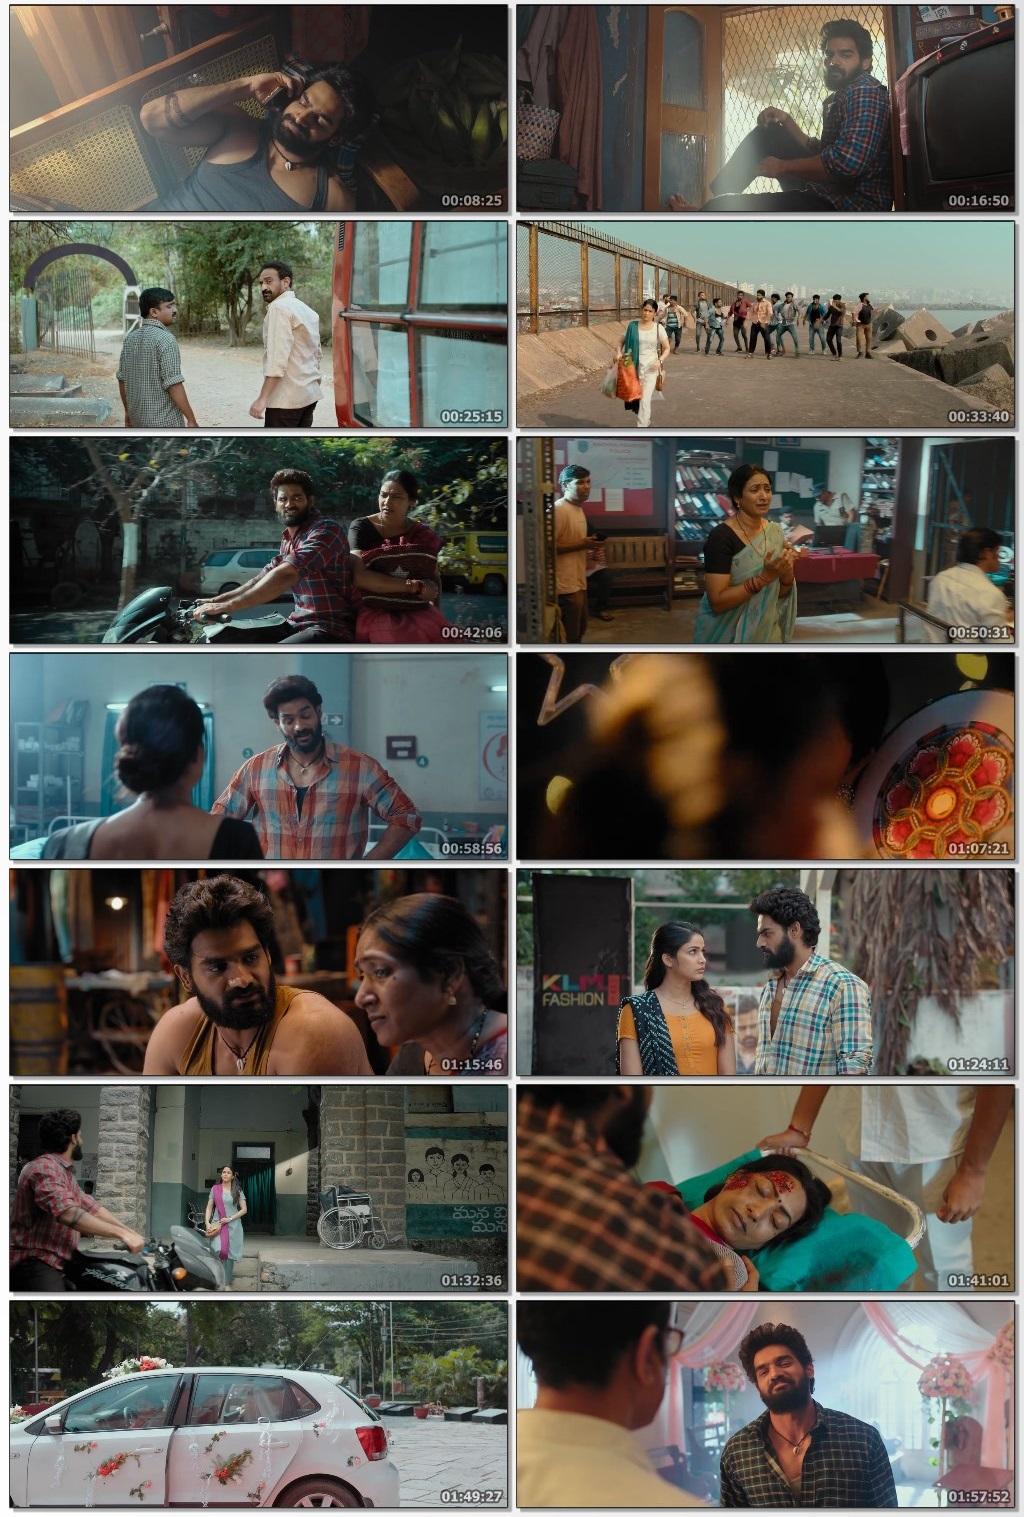 Chaavu-Kaburu-Challaga-2021-www-1kmovies-cyou-Telugu-720p-HDRip-ESub-1-4-GB-mkv-thumbs